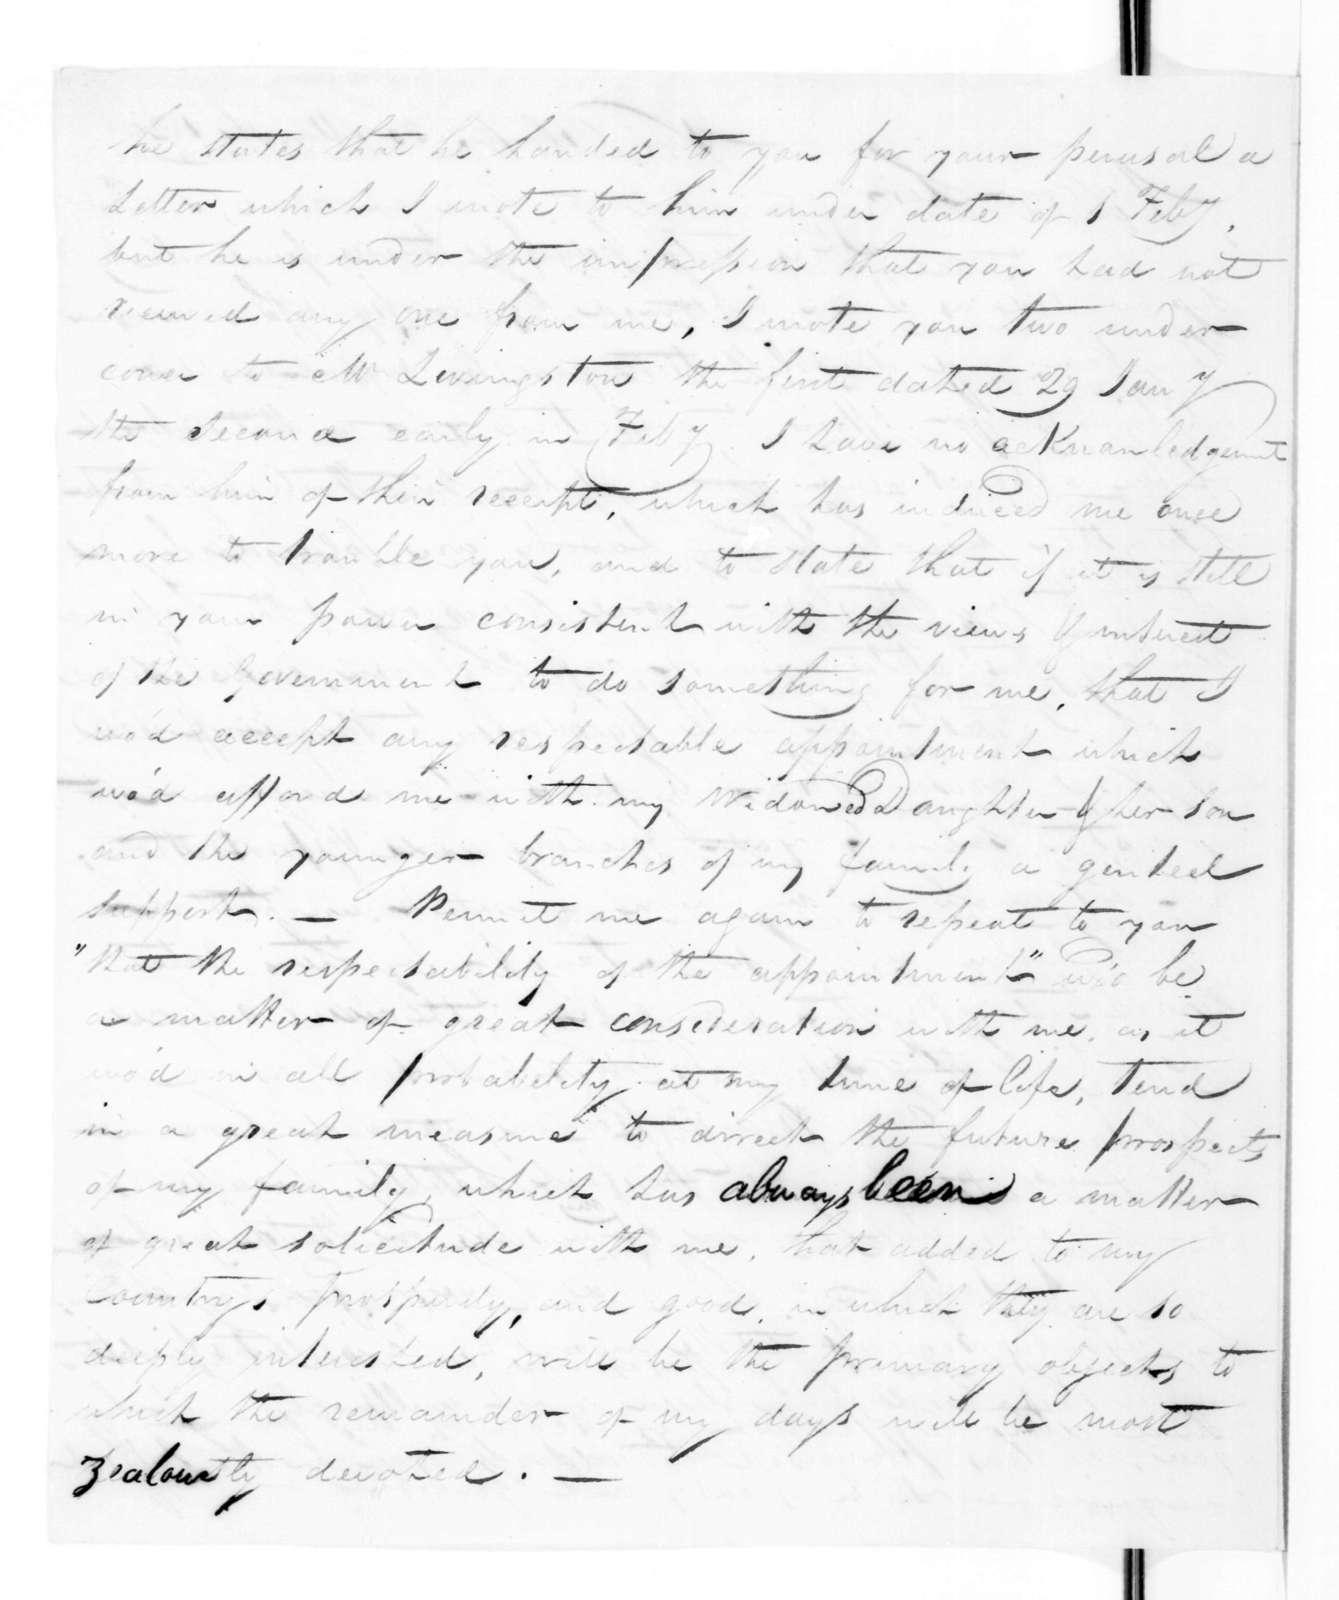 Joseph Saul to Andrew Jackson, March 31, 1828